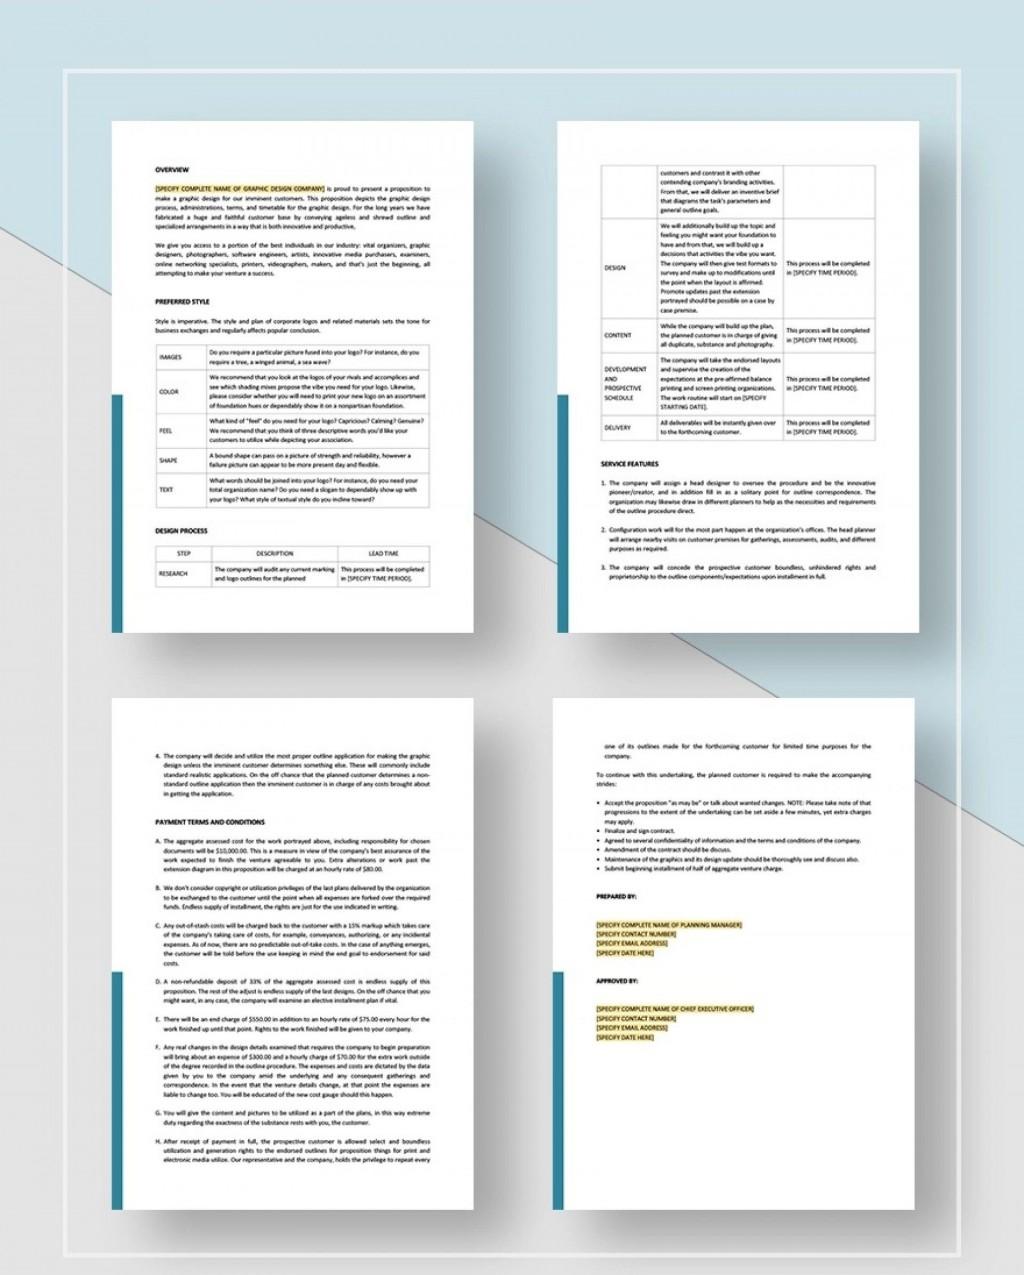 008 Excellent Graphic Design Proposal Sample High Definition  Pdf Free Template IndesignLarge